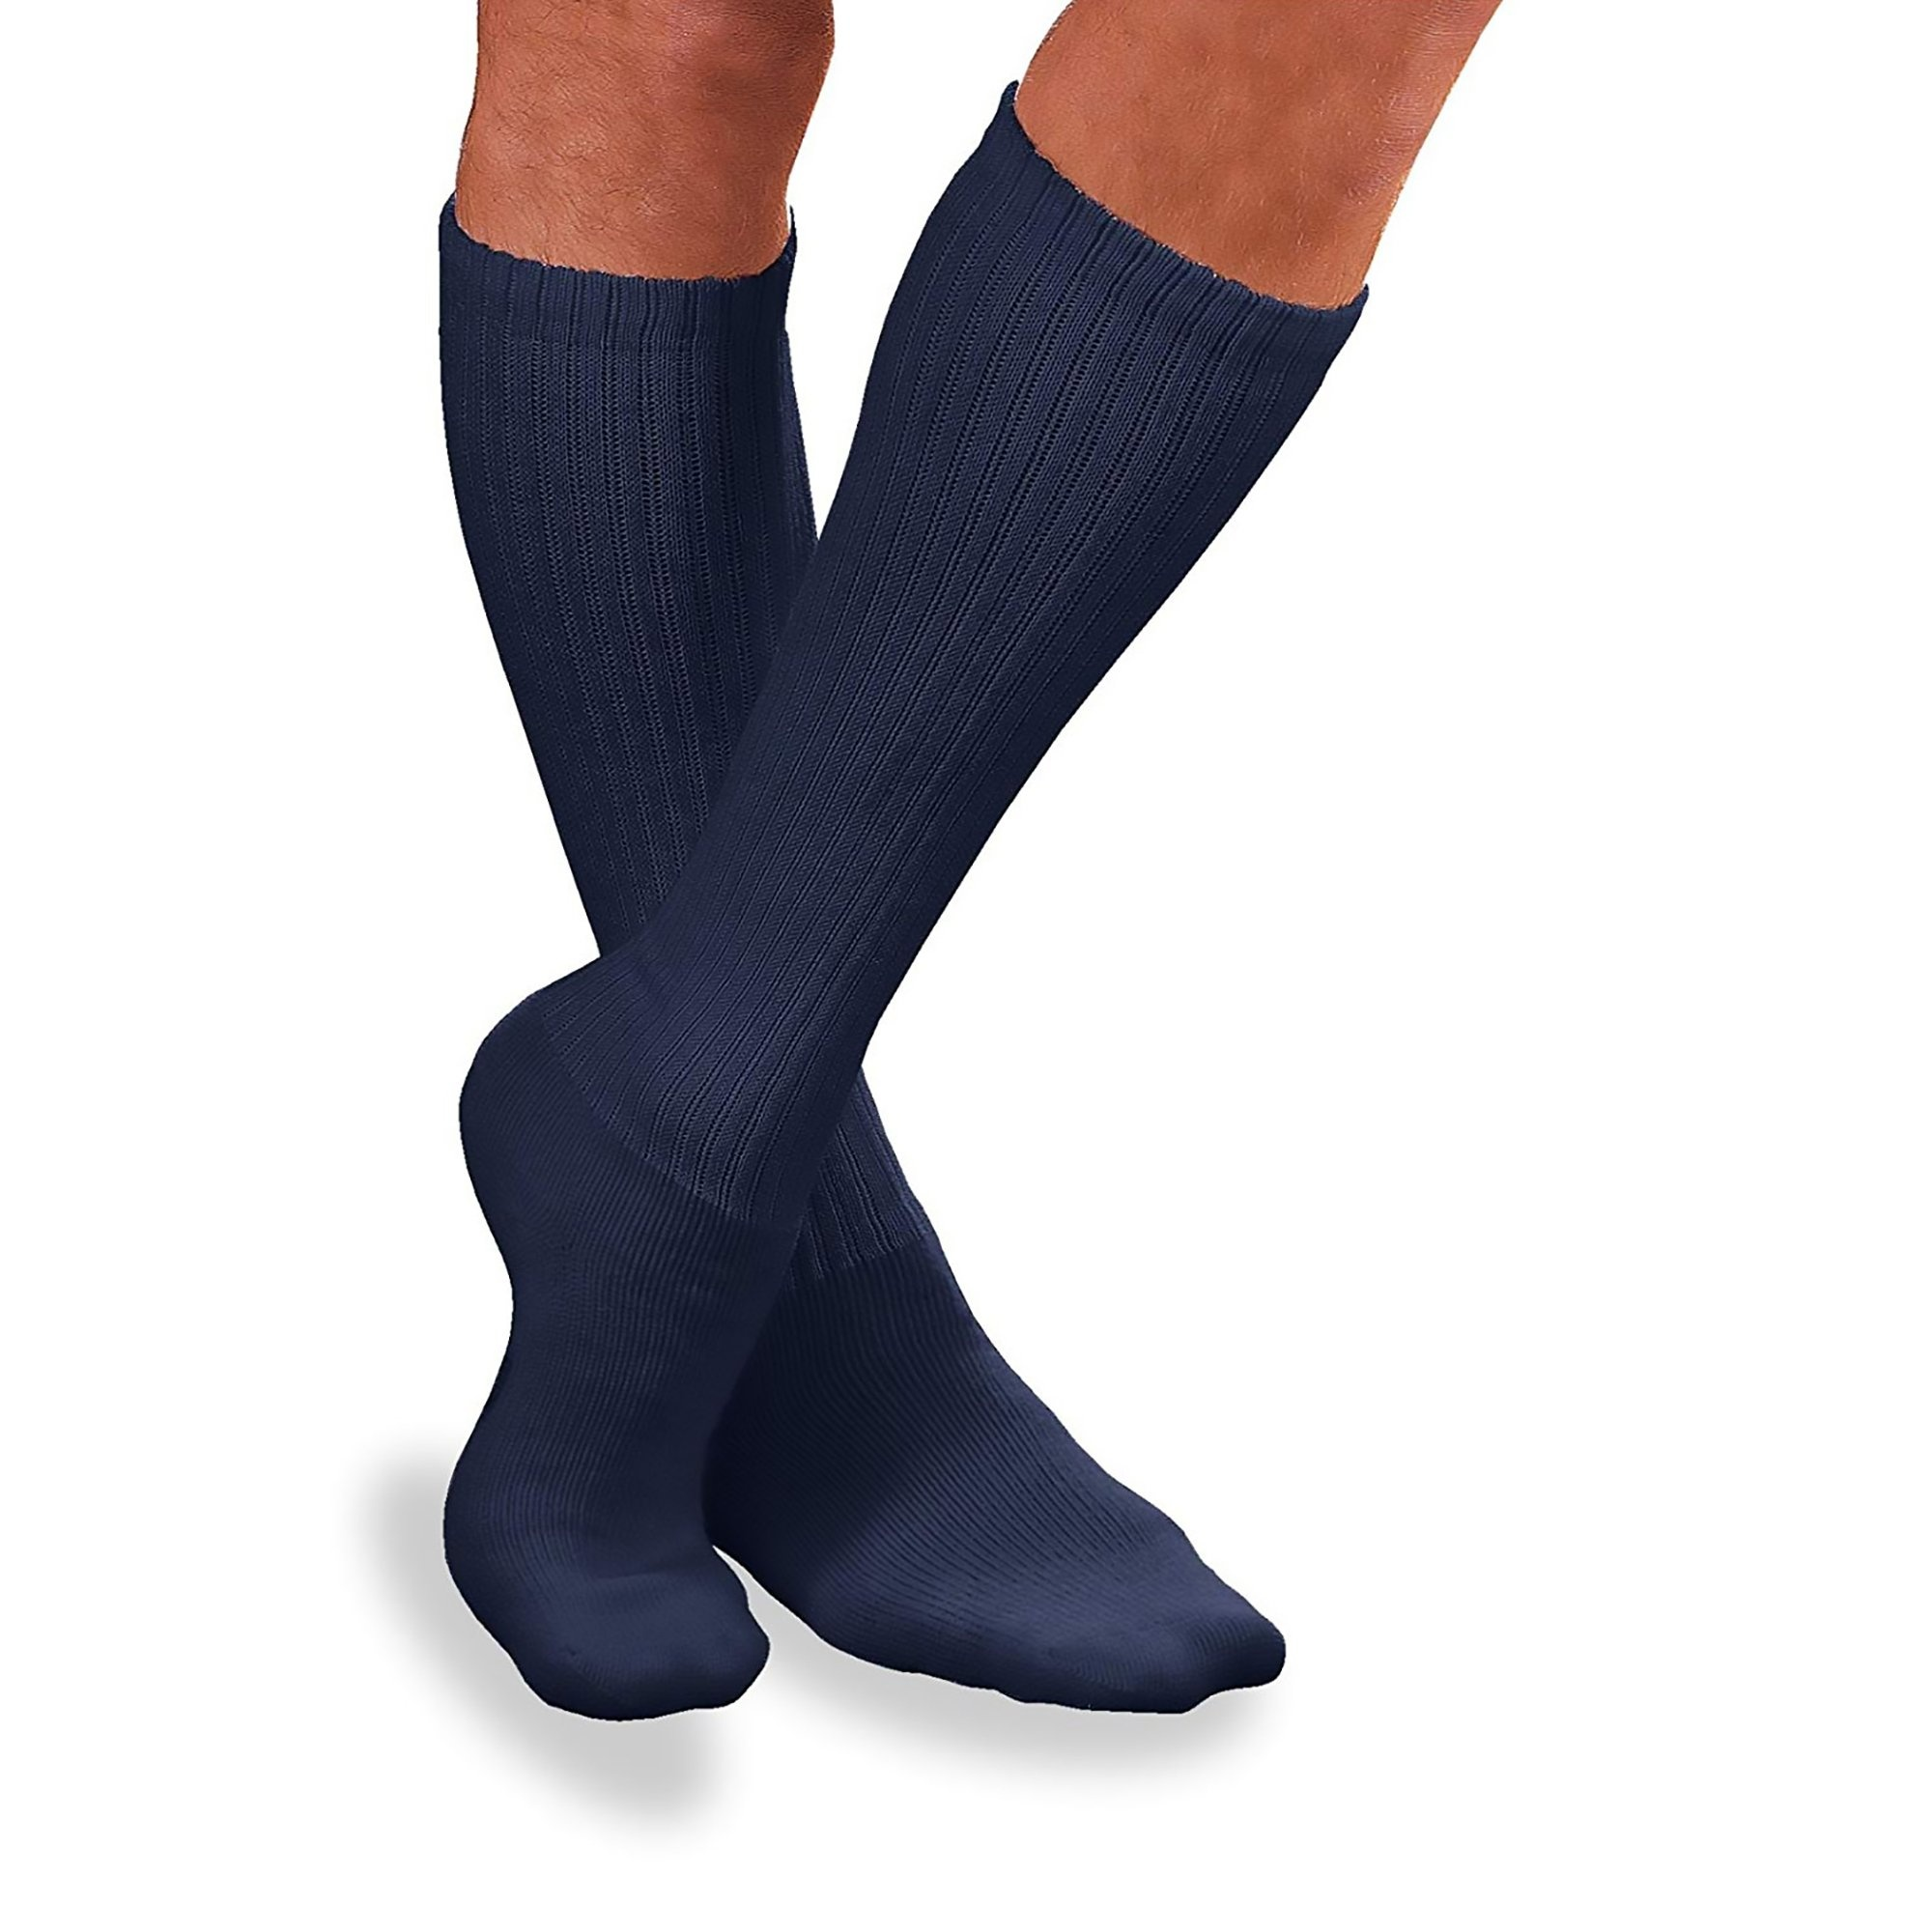 JOBST Sensifoot Crew Length Diabetic Compression Socks, 8-15 mmHg, 110846, Navy - Small - 1 Pair